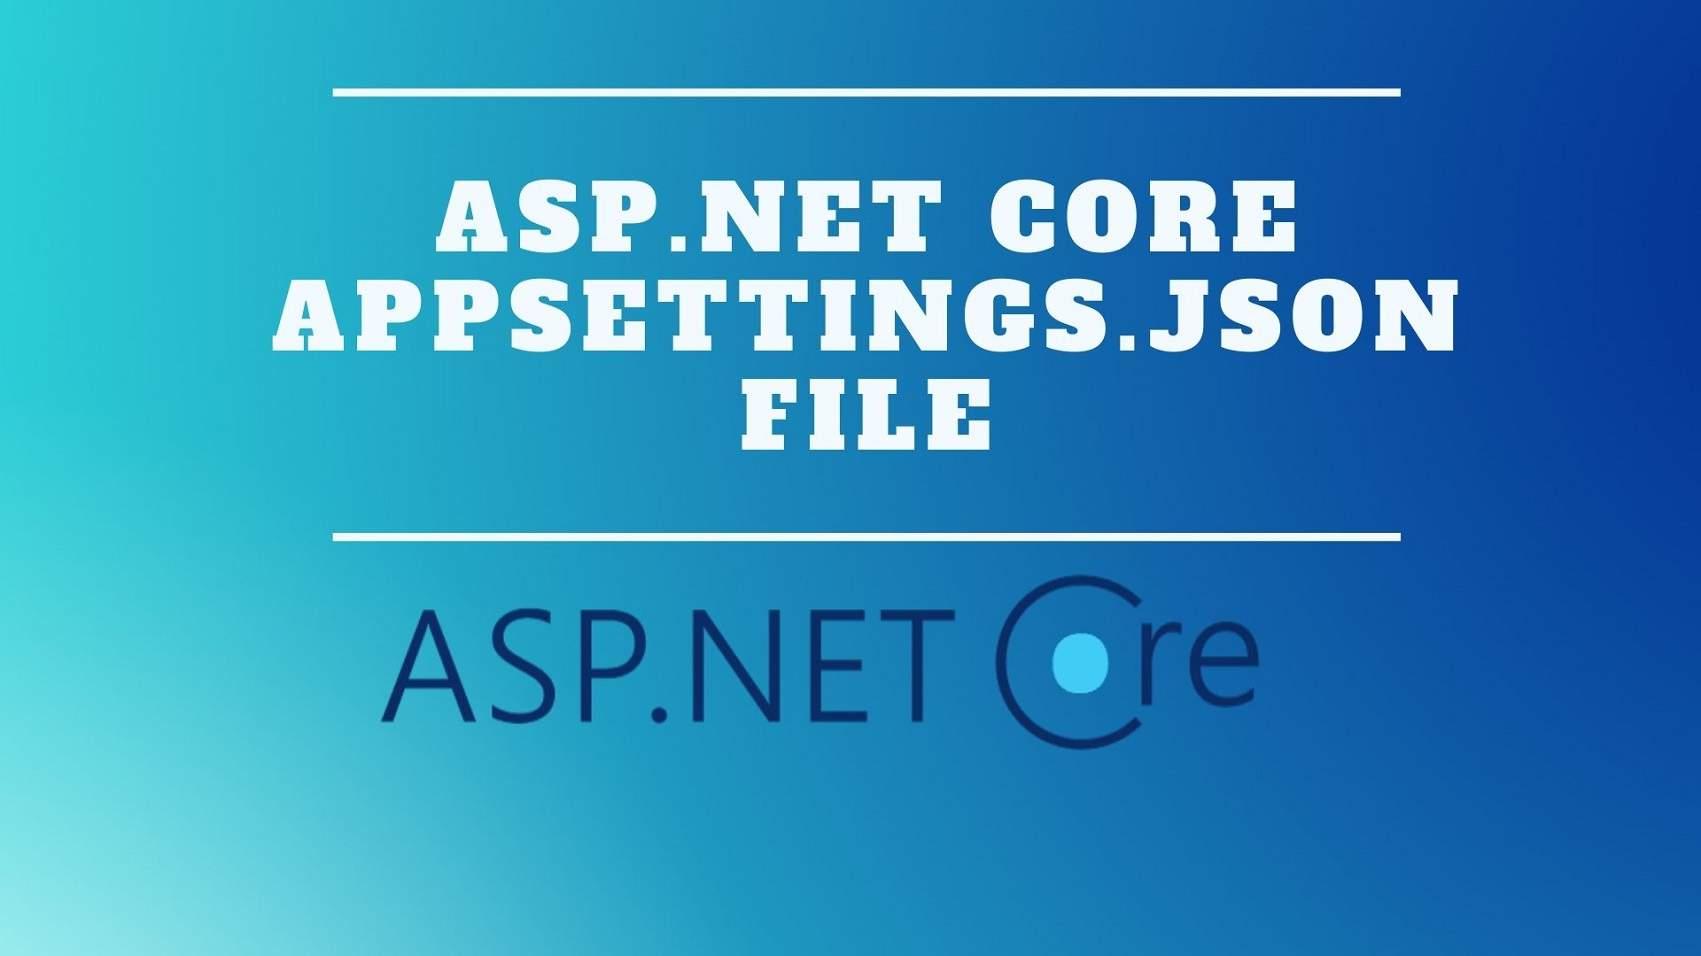 ASP.NET Core appsettings.json file